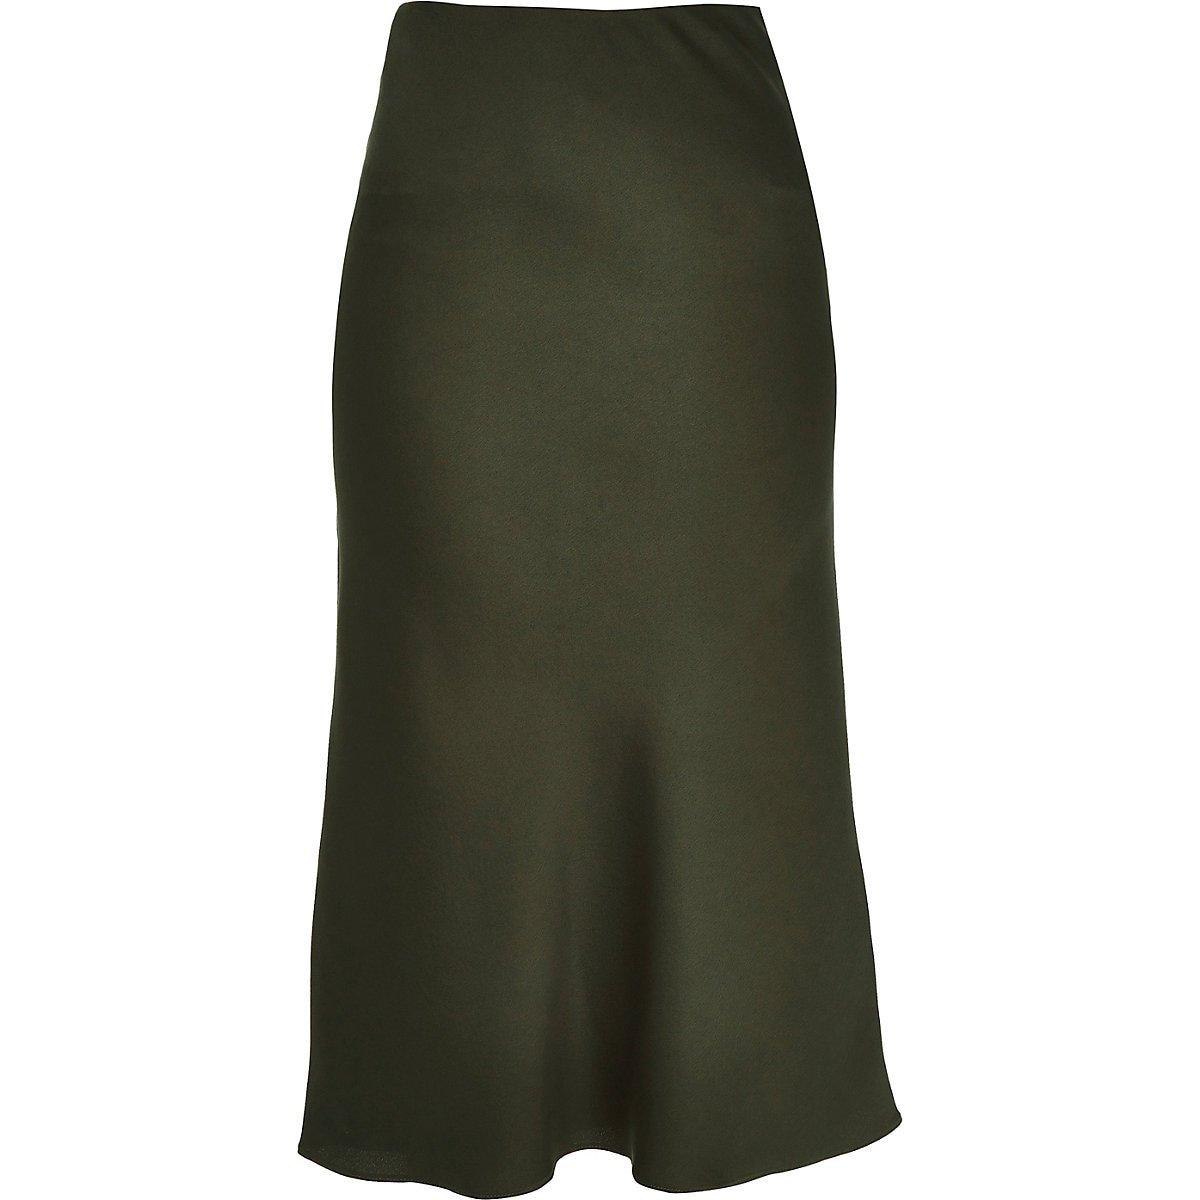 Khaki bias cut midi skirt - Midi Skirts - Skirts - women